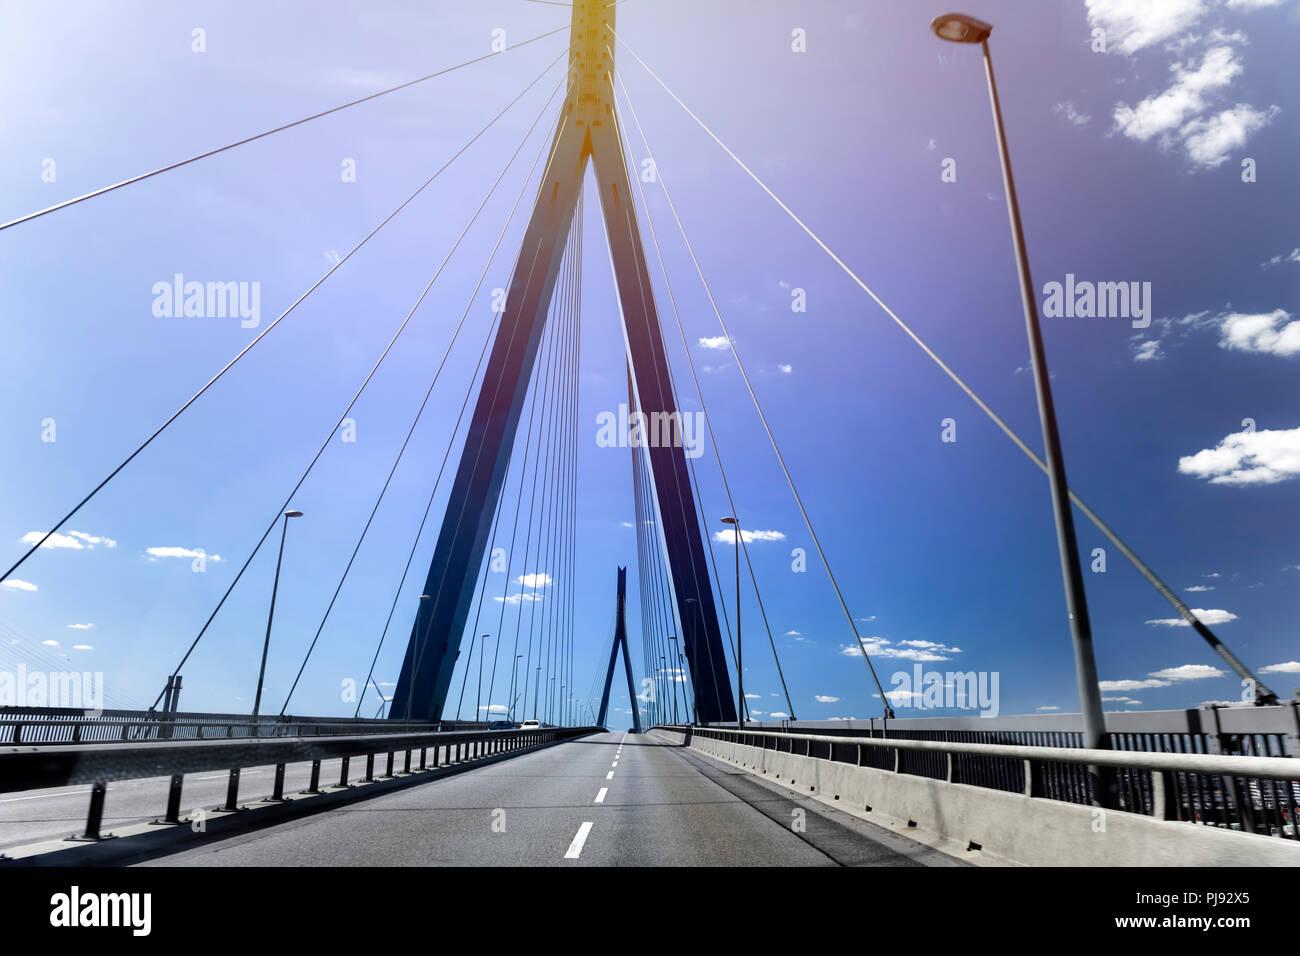 On the Köhlbrandbrücke in Hamburg, Germany, Europe, Auf der Köhlbrandbrücke in Hamburg, Deutschland, Europa - Stock Image